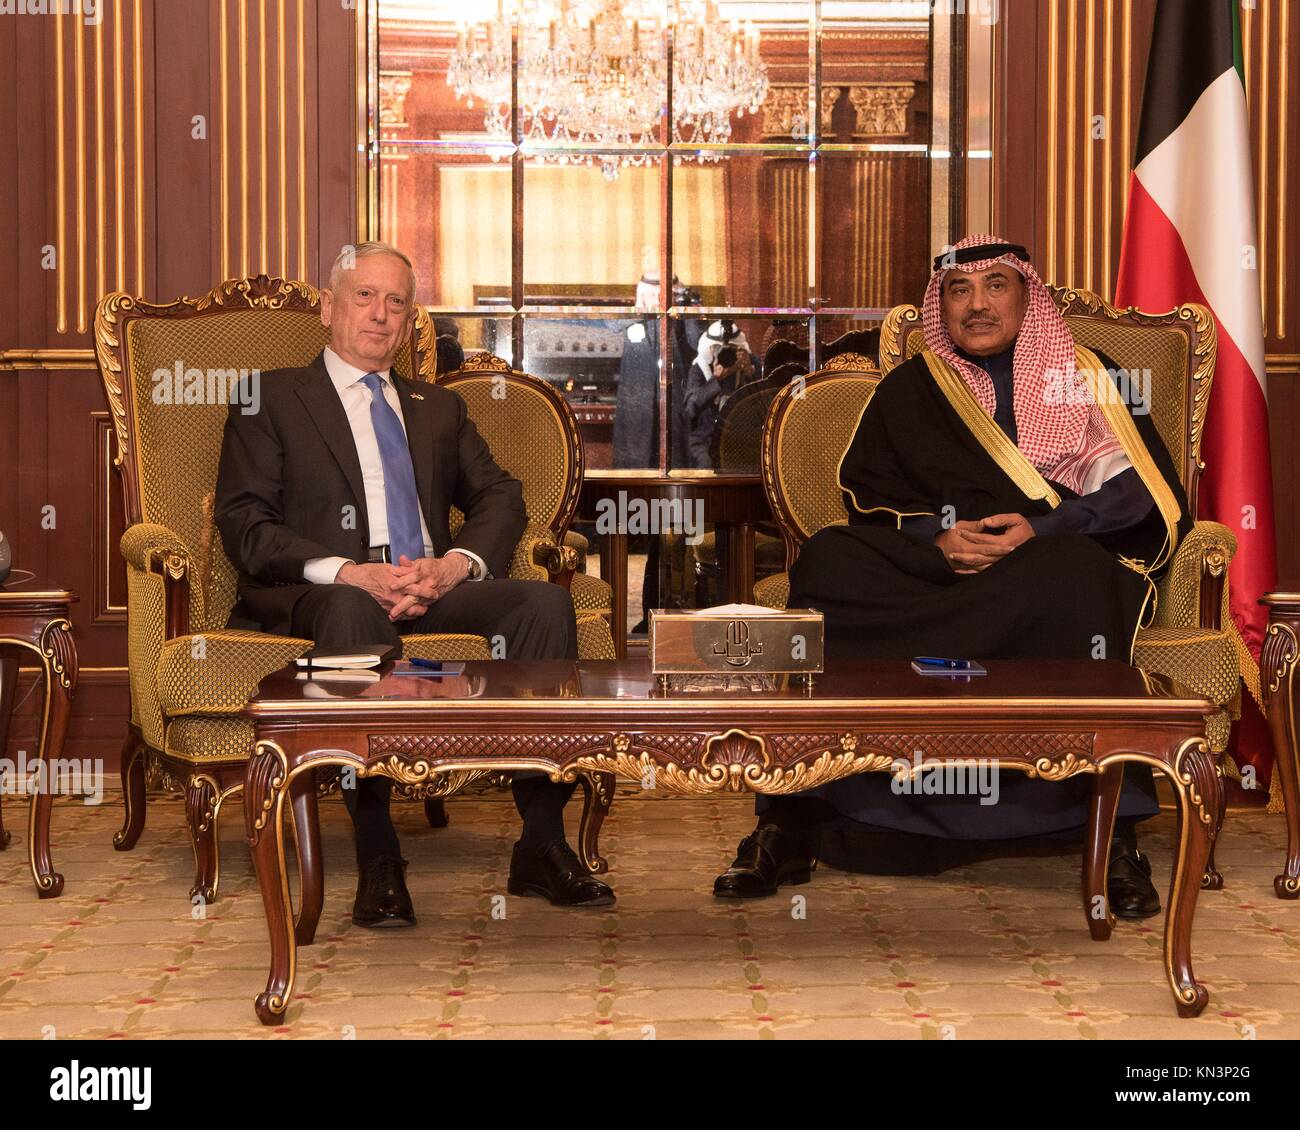 U.S. Defense Secretary James Mattis (left) meets with Kuwaiti Foreign Affairs Minister Sabah Khalid Al Hamad Al - Stock Image